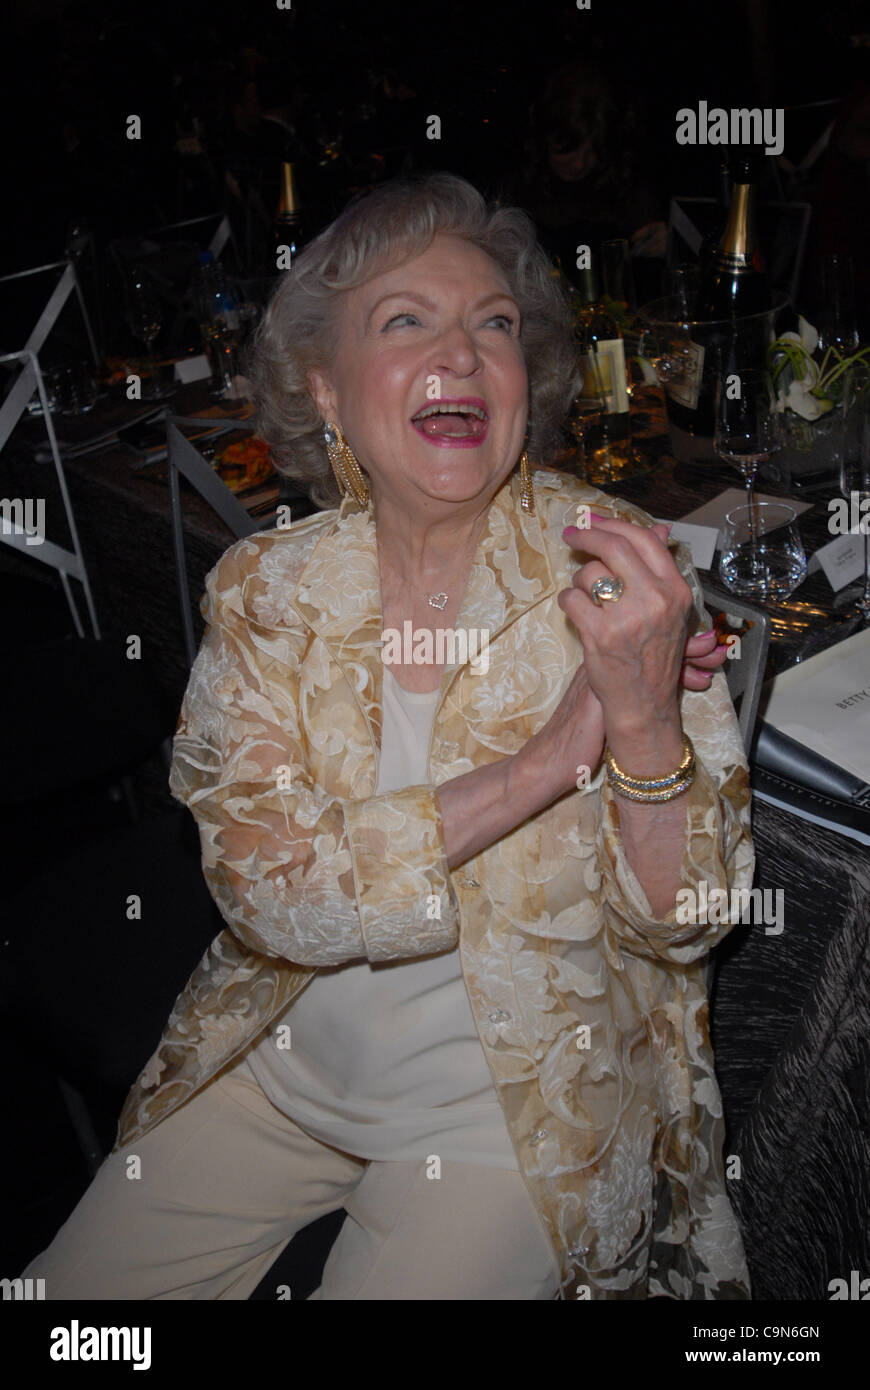 29. Betty White 29. Betty White new images